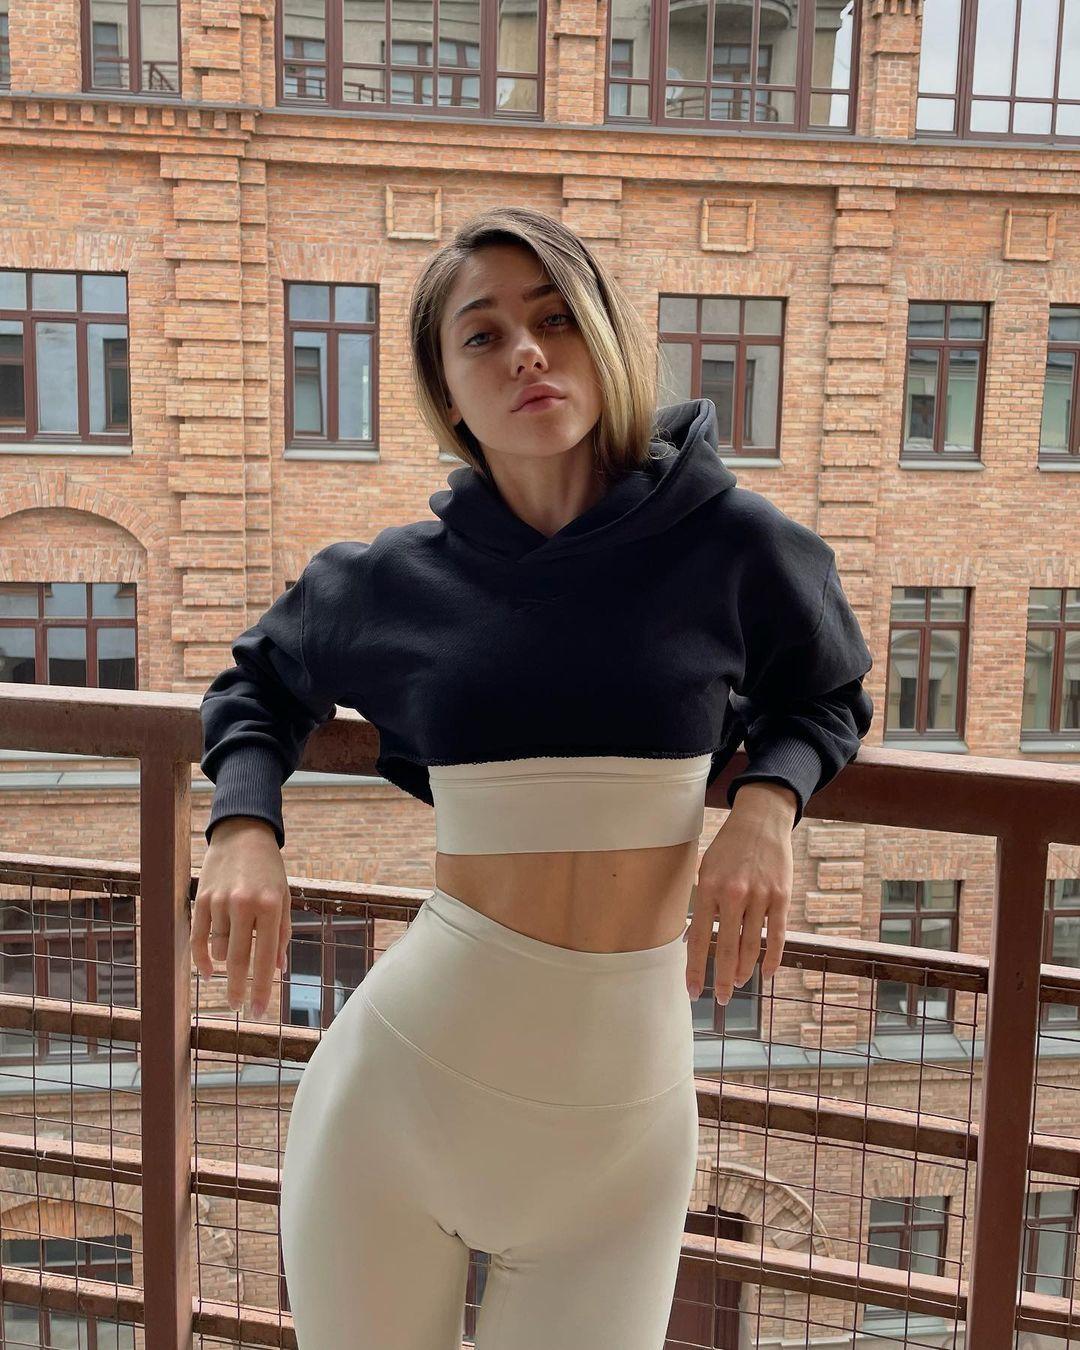 Amalia-Annenkova-Wallpapers-Insta-FIt-Bio-2